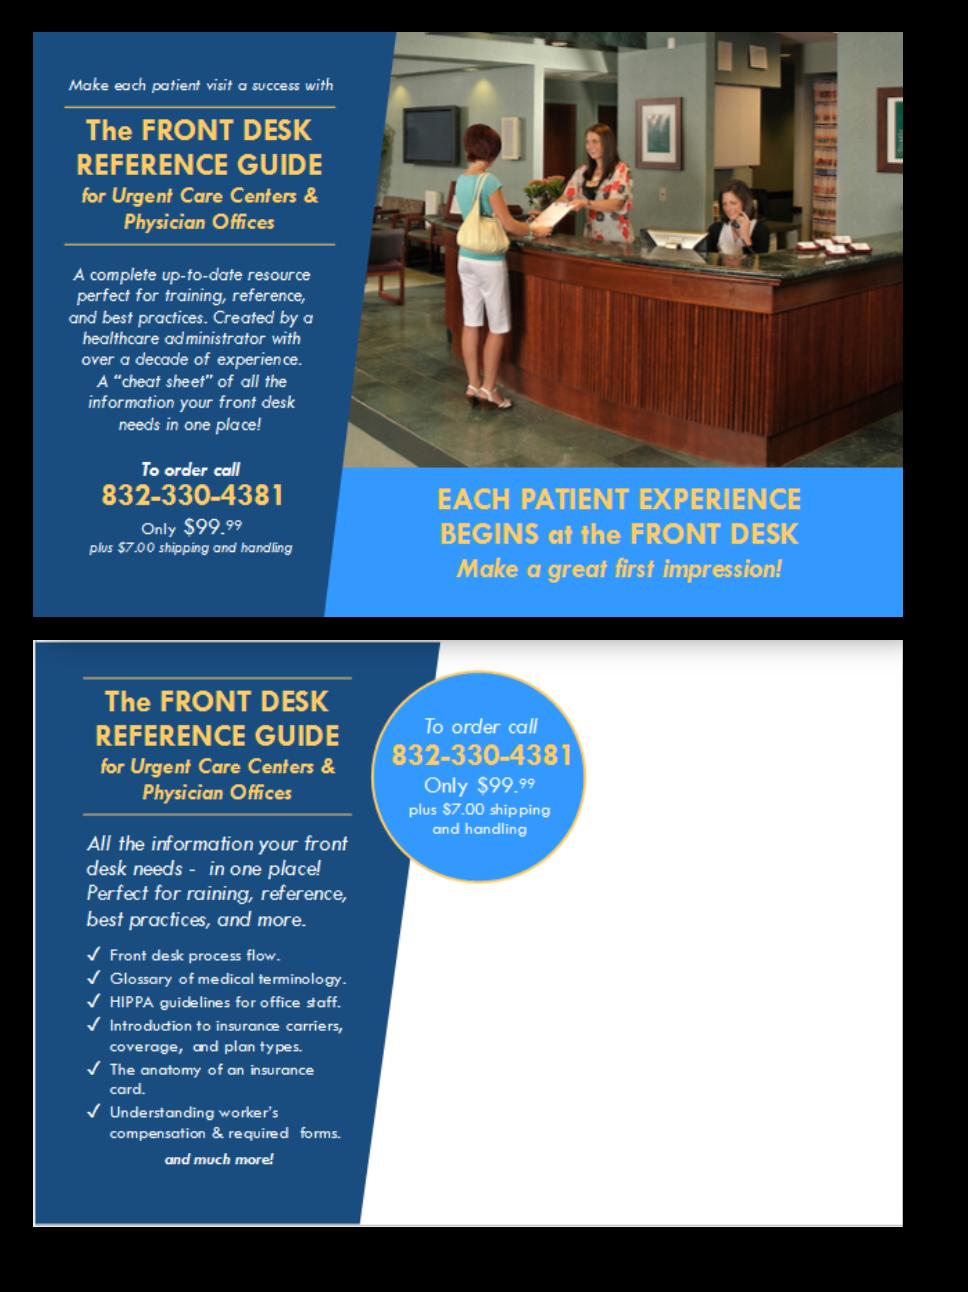 Comprehensive guide for the front desk medical office staff  | 9